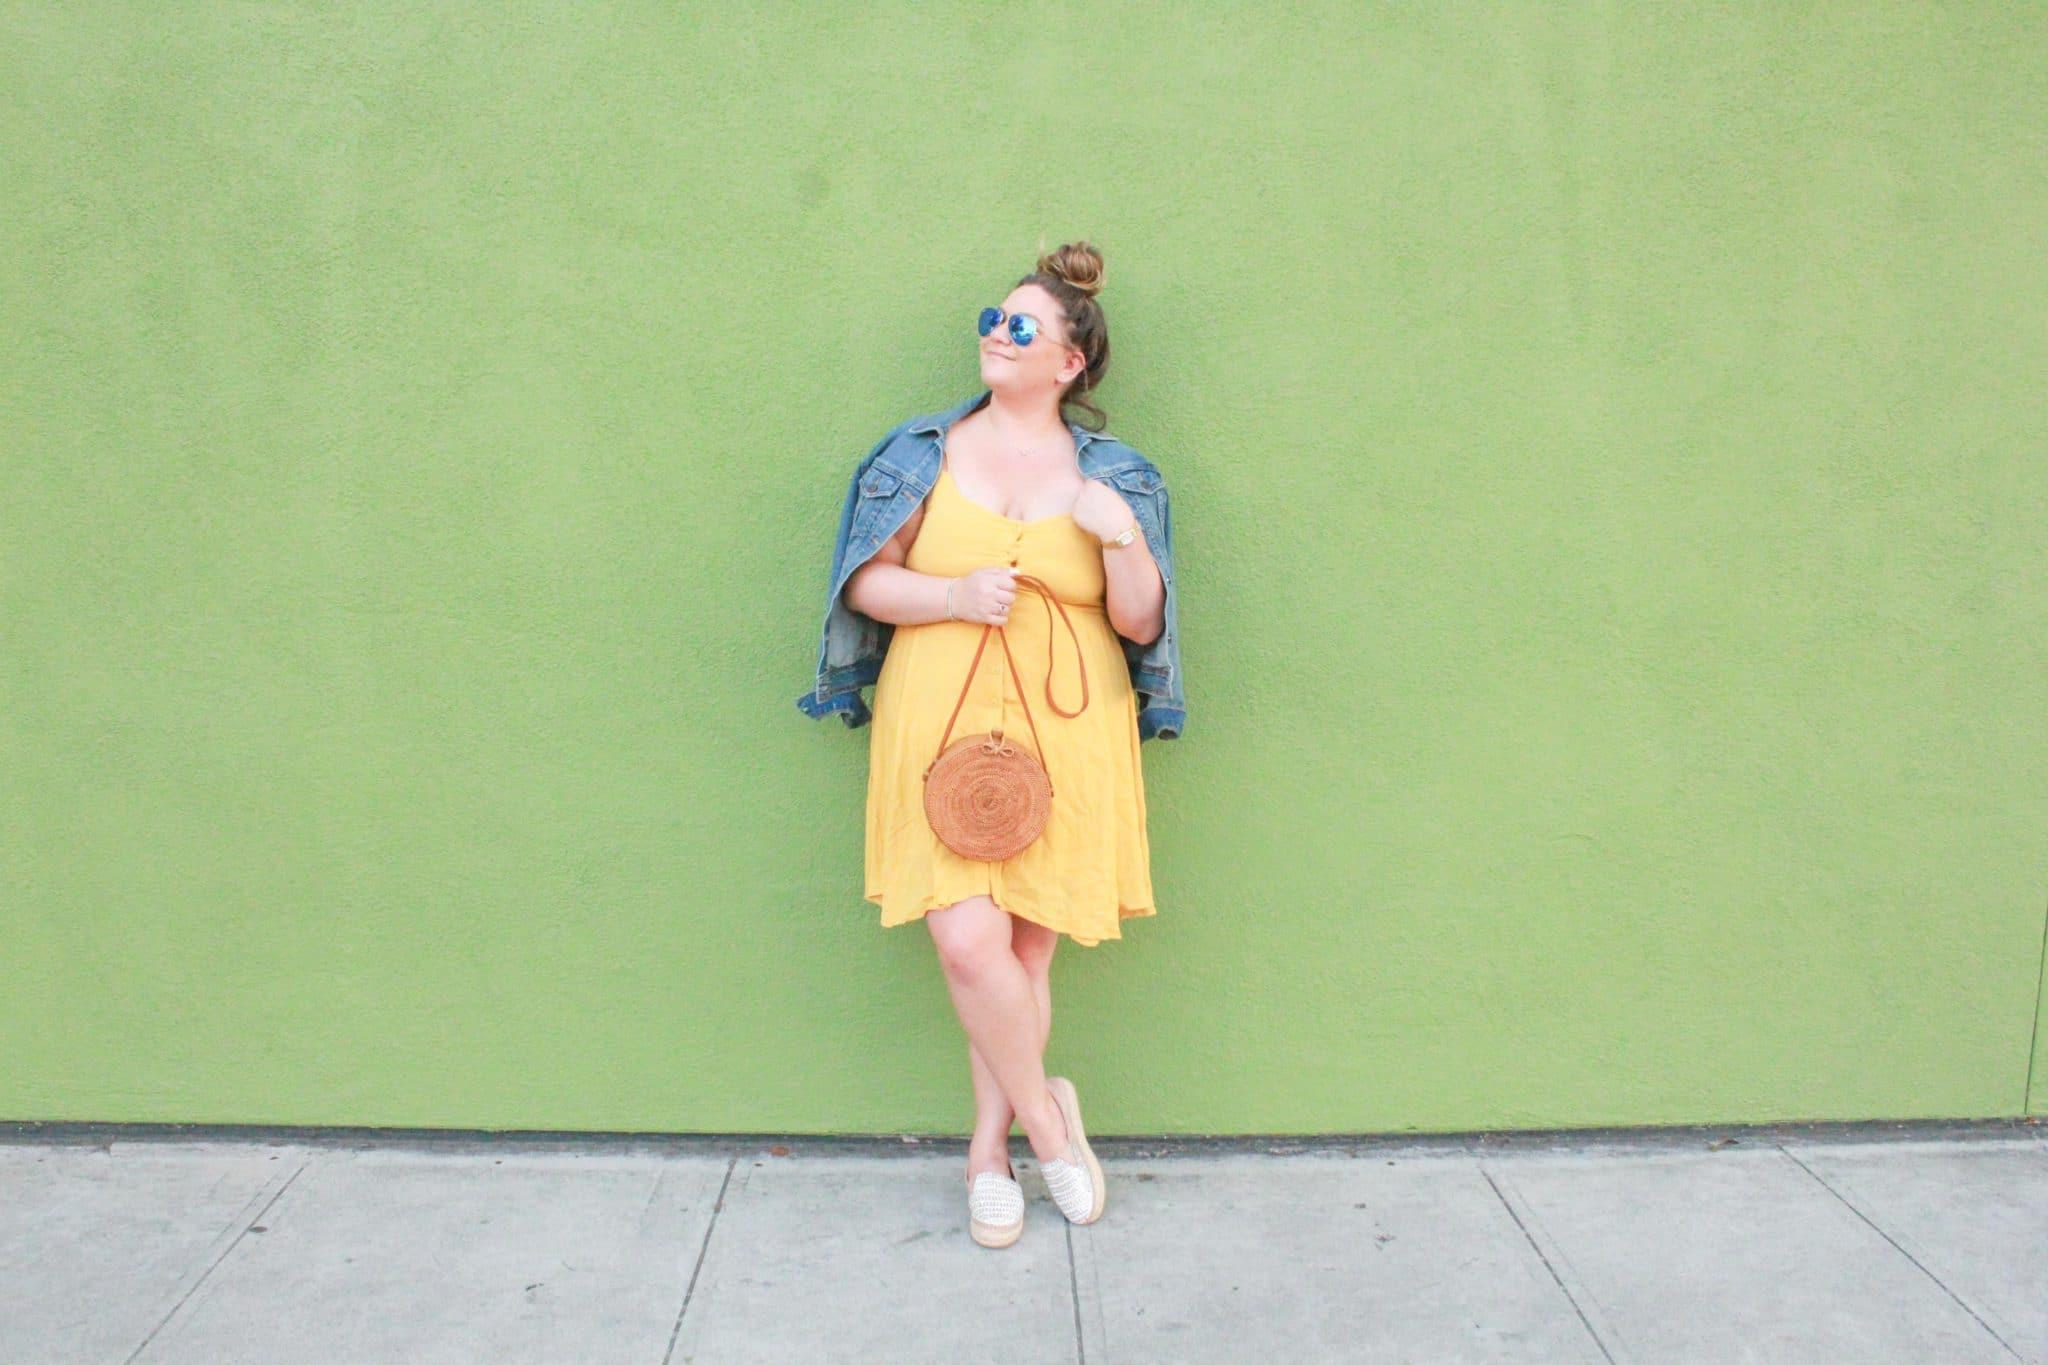 missyonmadison, missyonmadison blog, missyonmadison blogger, la blogger, fashion blog, fashion blogger, fall style, shop the mint, circle straw bag, summer trends, denim jacket, old navy denim jacket, yellow mini dress, yellow spaghetti strap dress, raybans, espadrille flats, steve madden proud, steve madden espadrilles, style blogger, messy bun, fall trends,